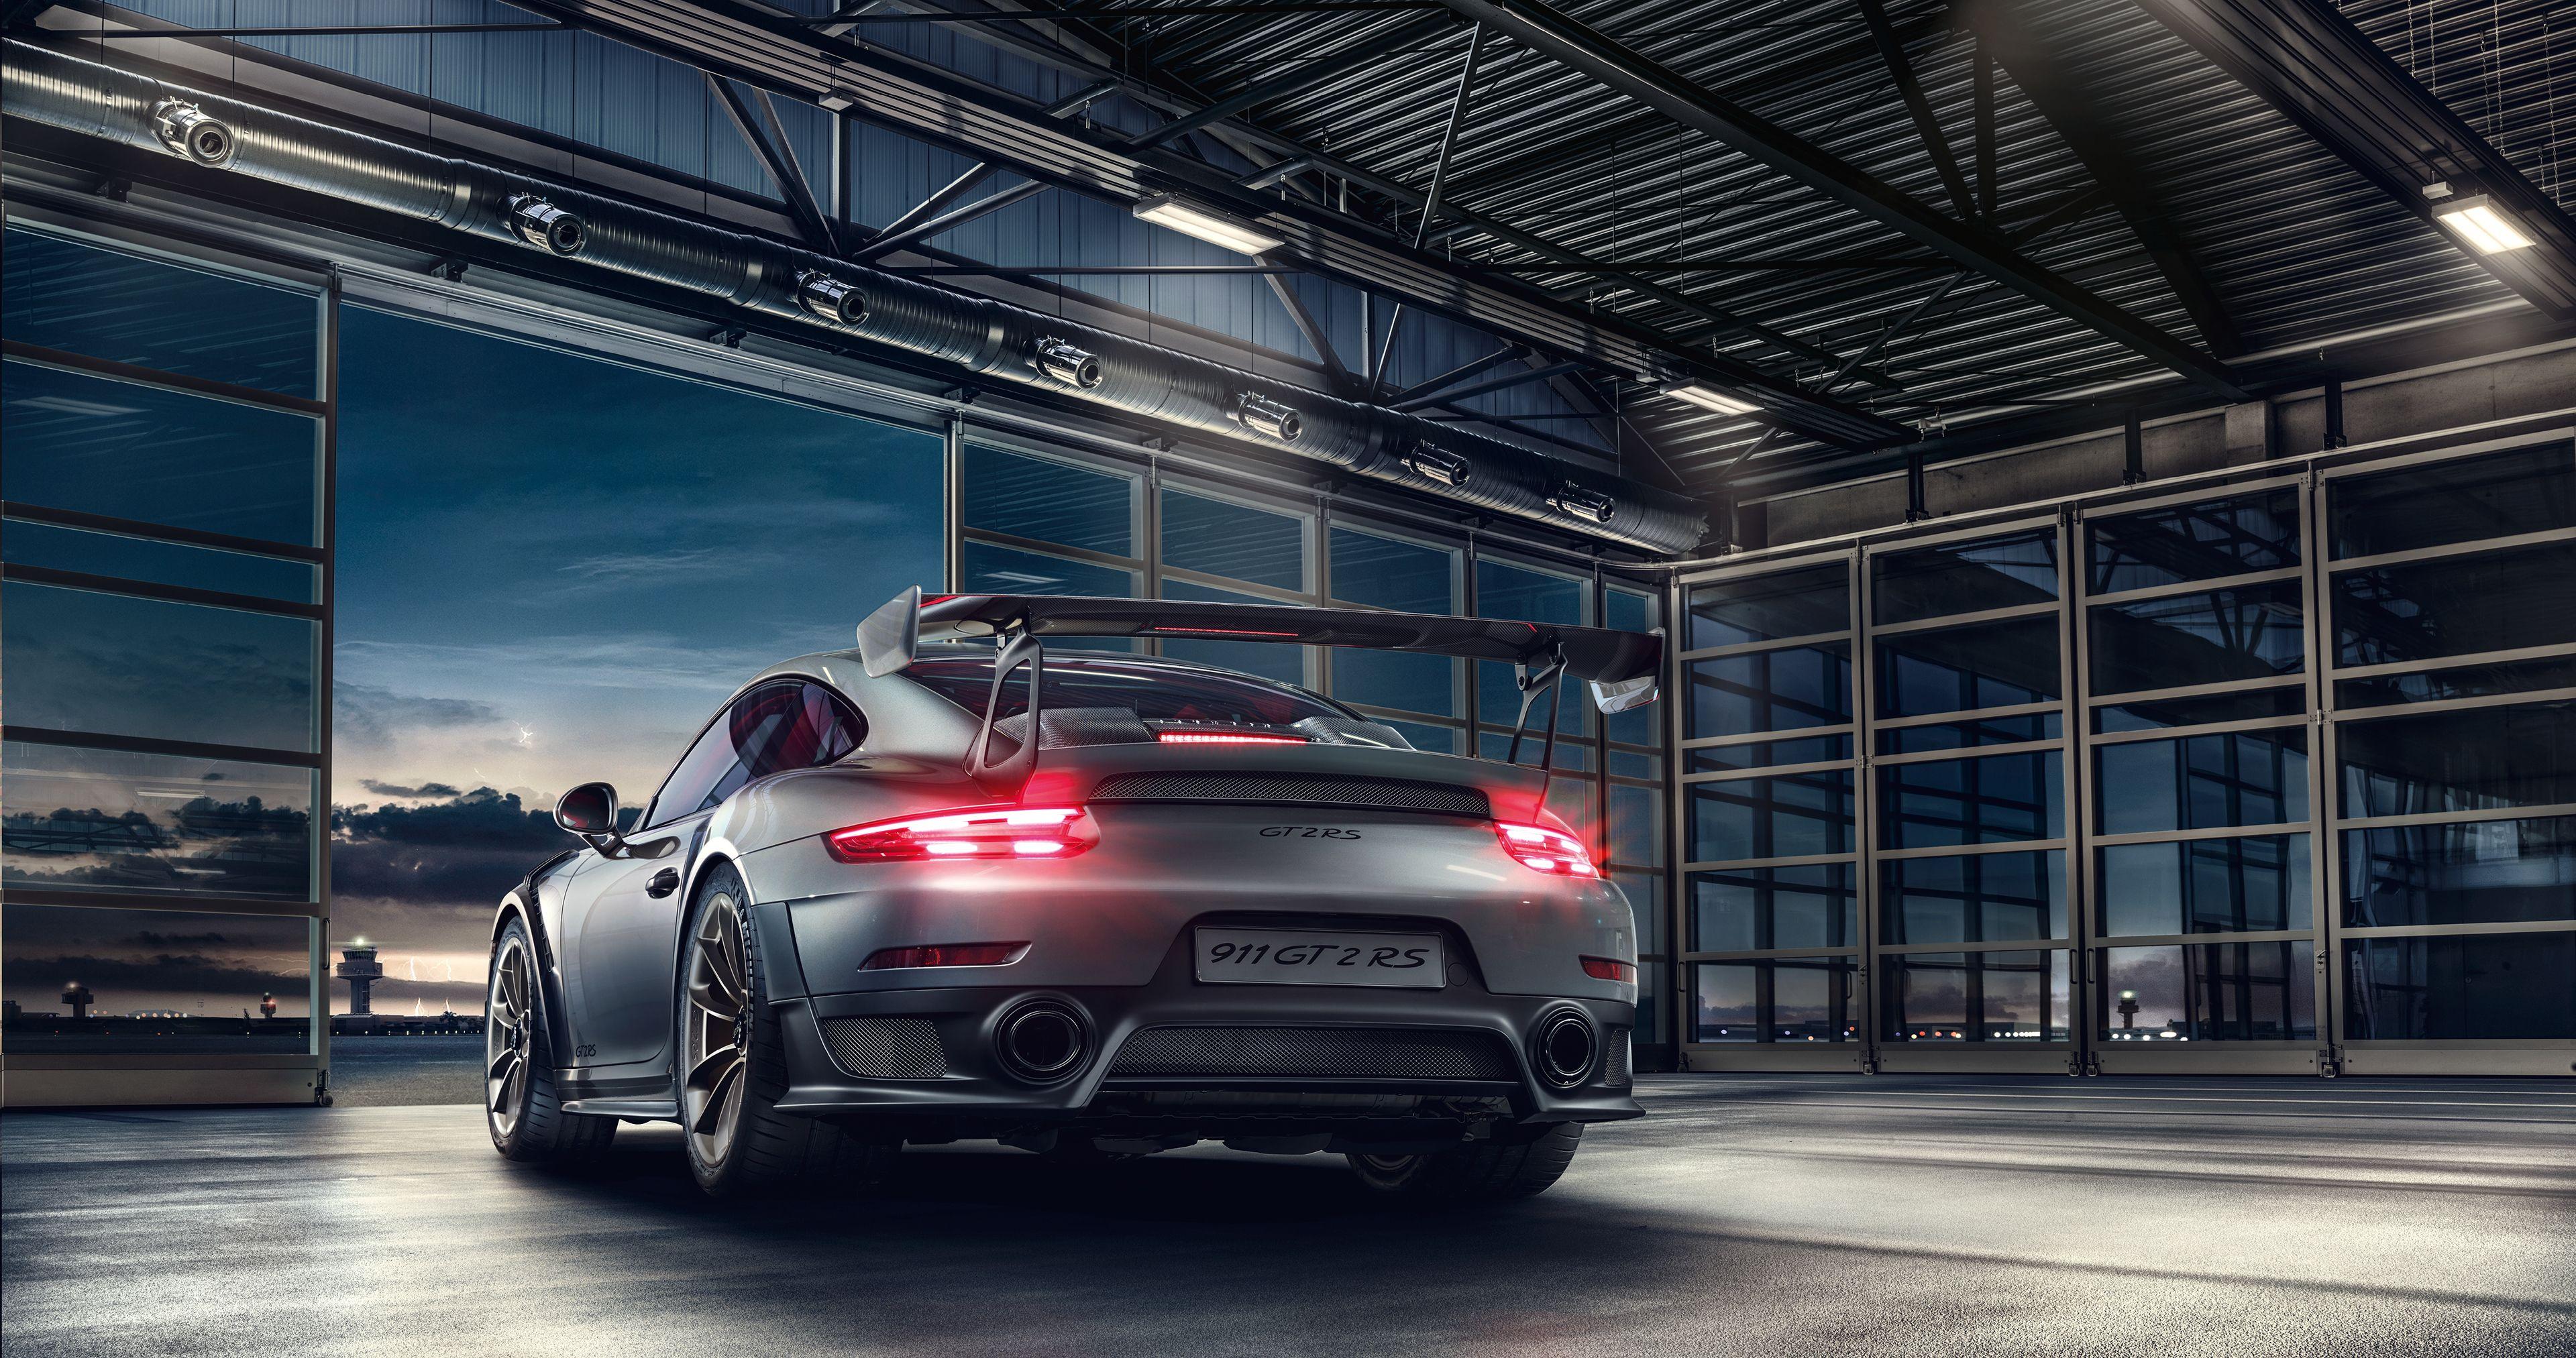 Wallpaper Porsche 911 GT2 RS, Rear view, HD, 4K, Automotive / Cars